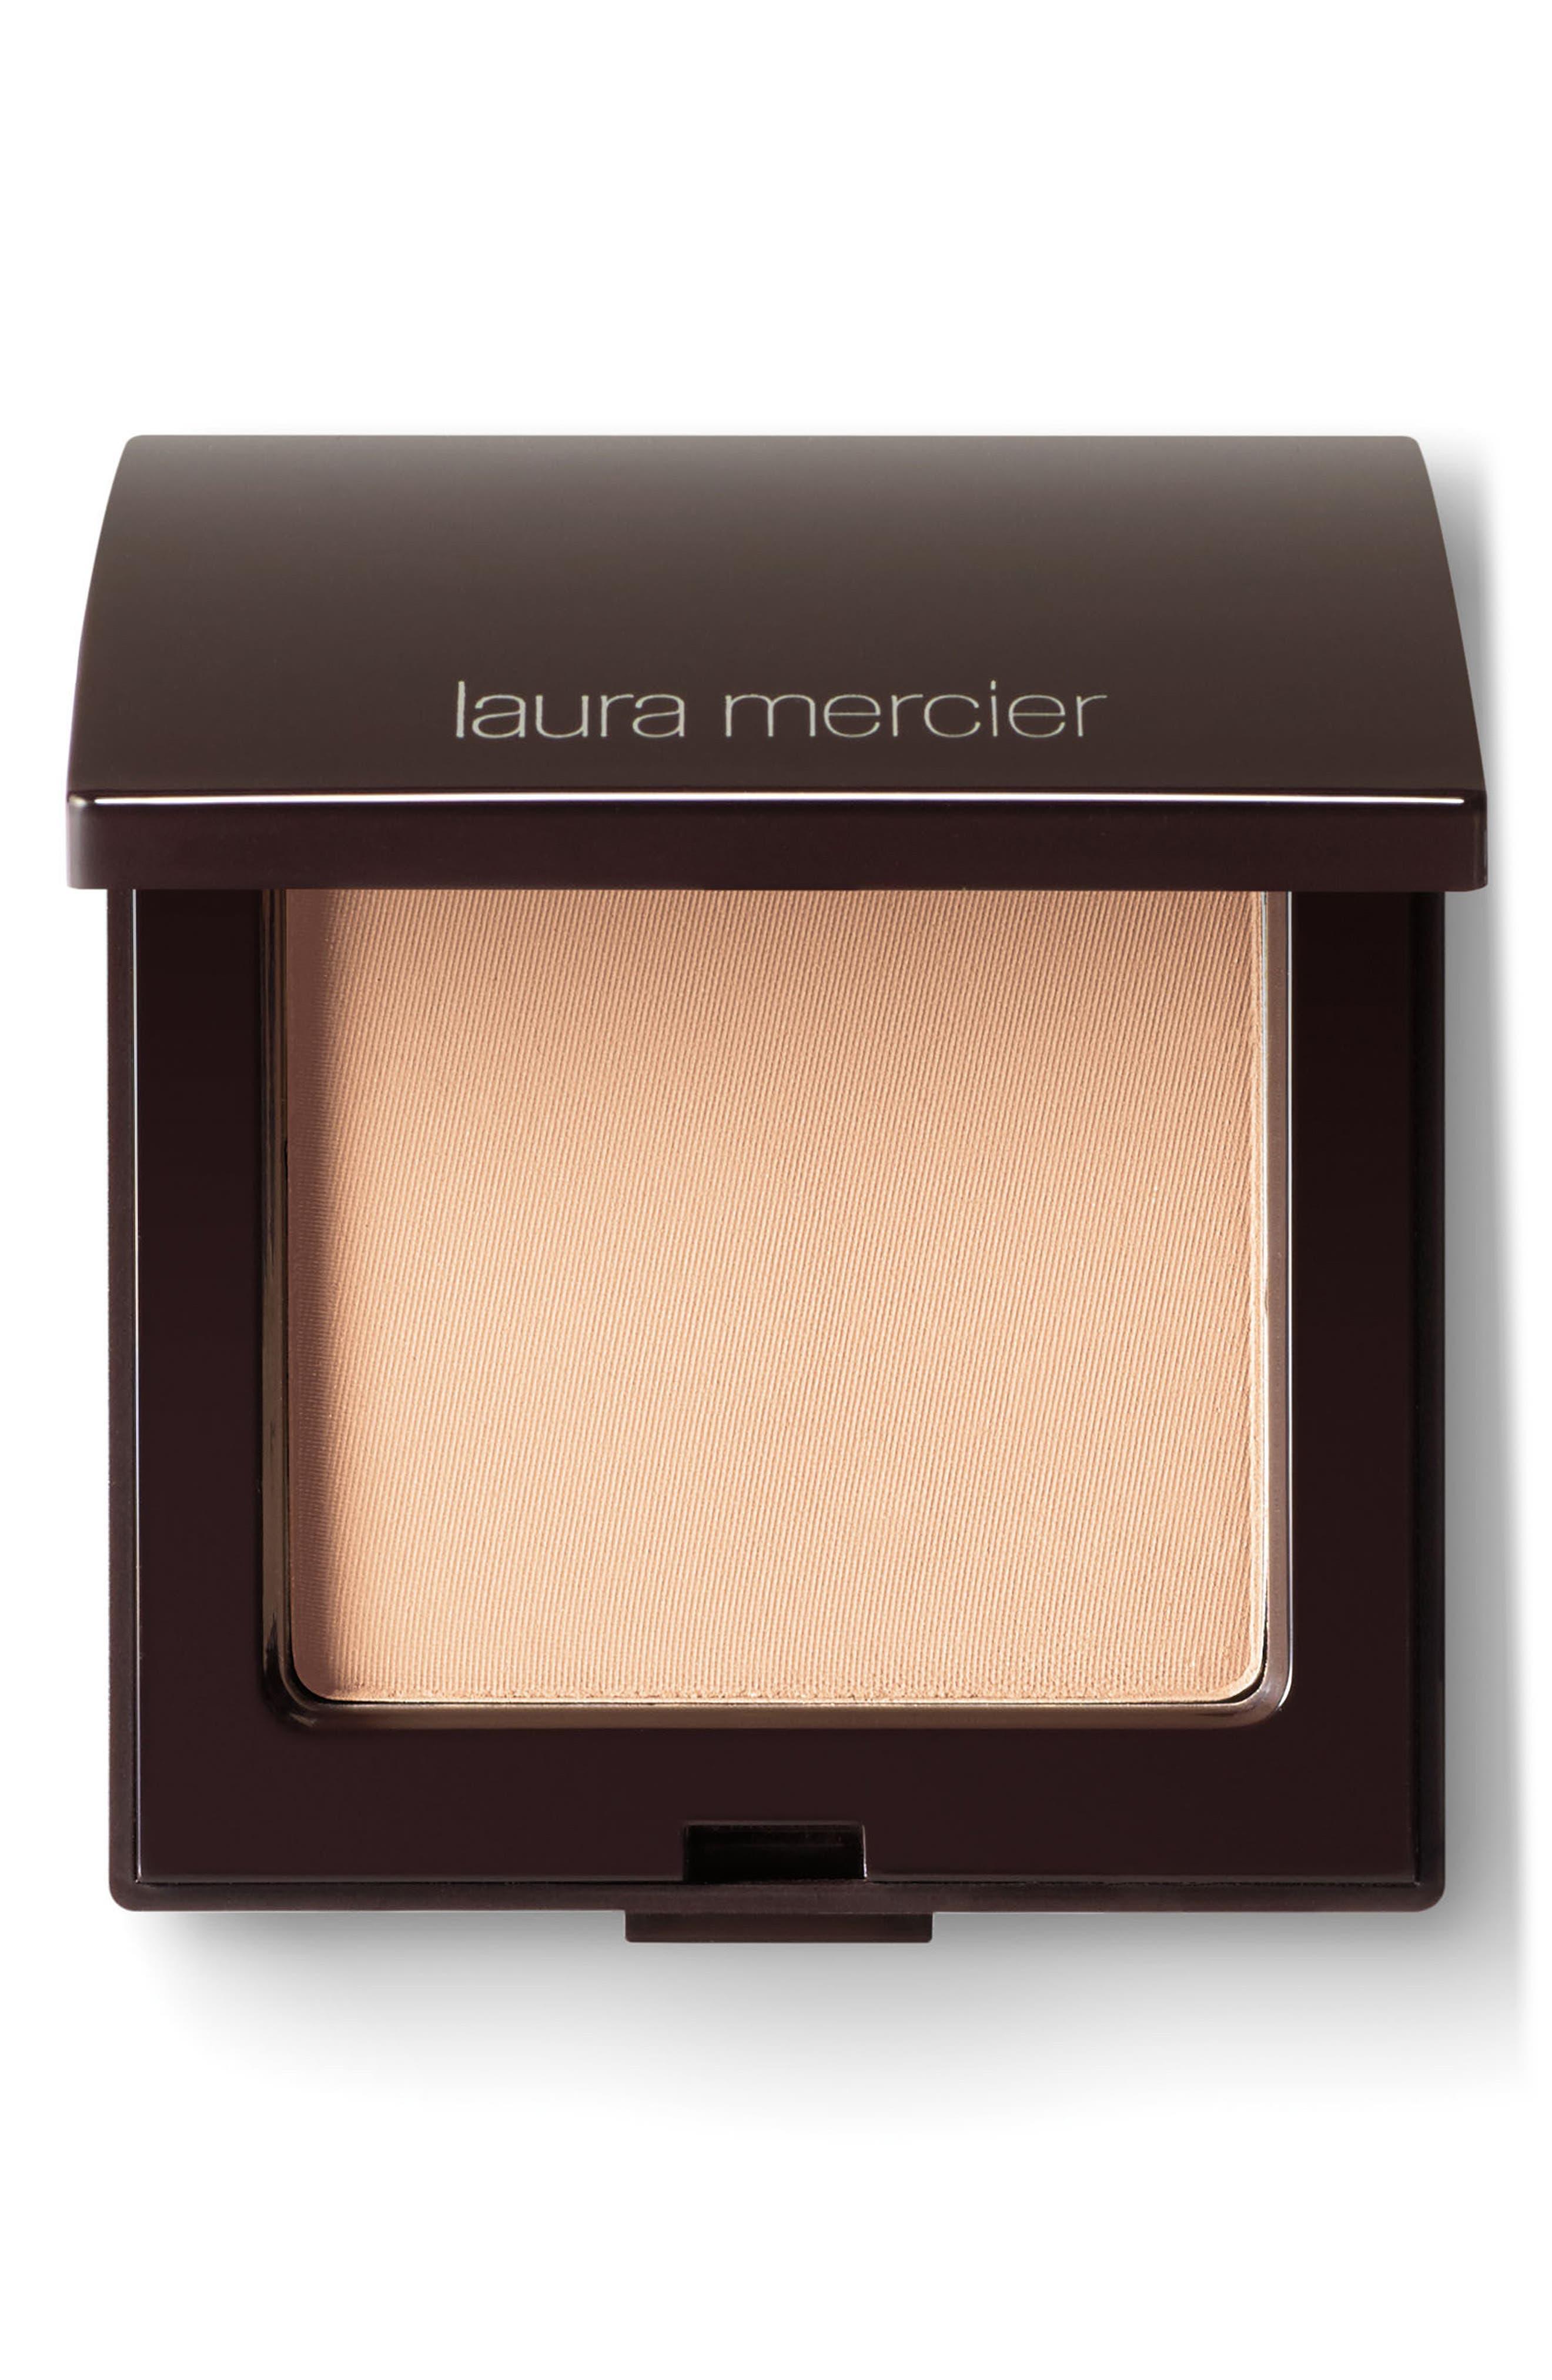 Laura Mercier Mineral Pressed Powder